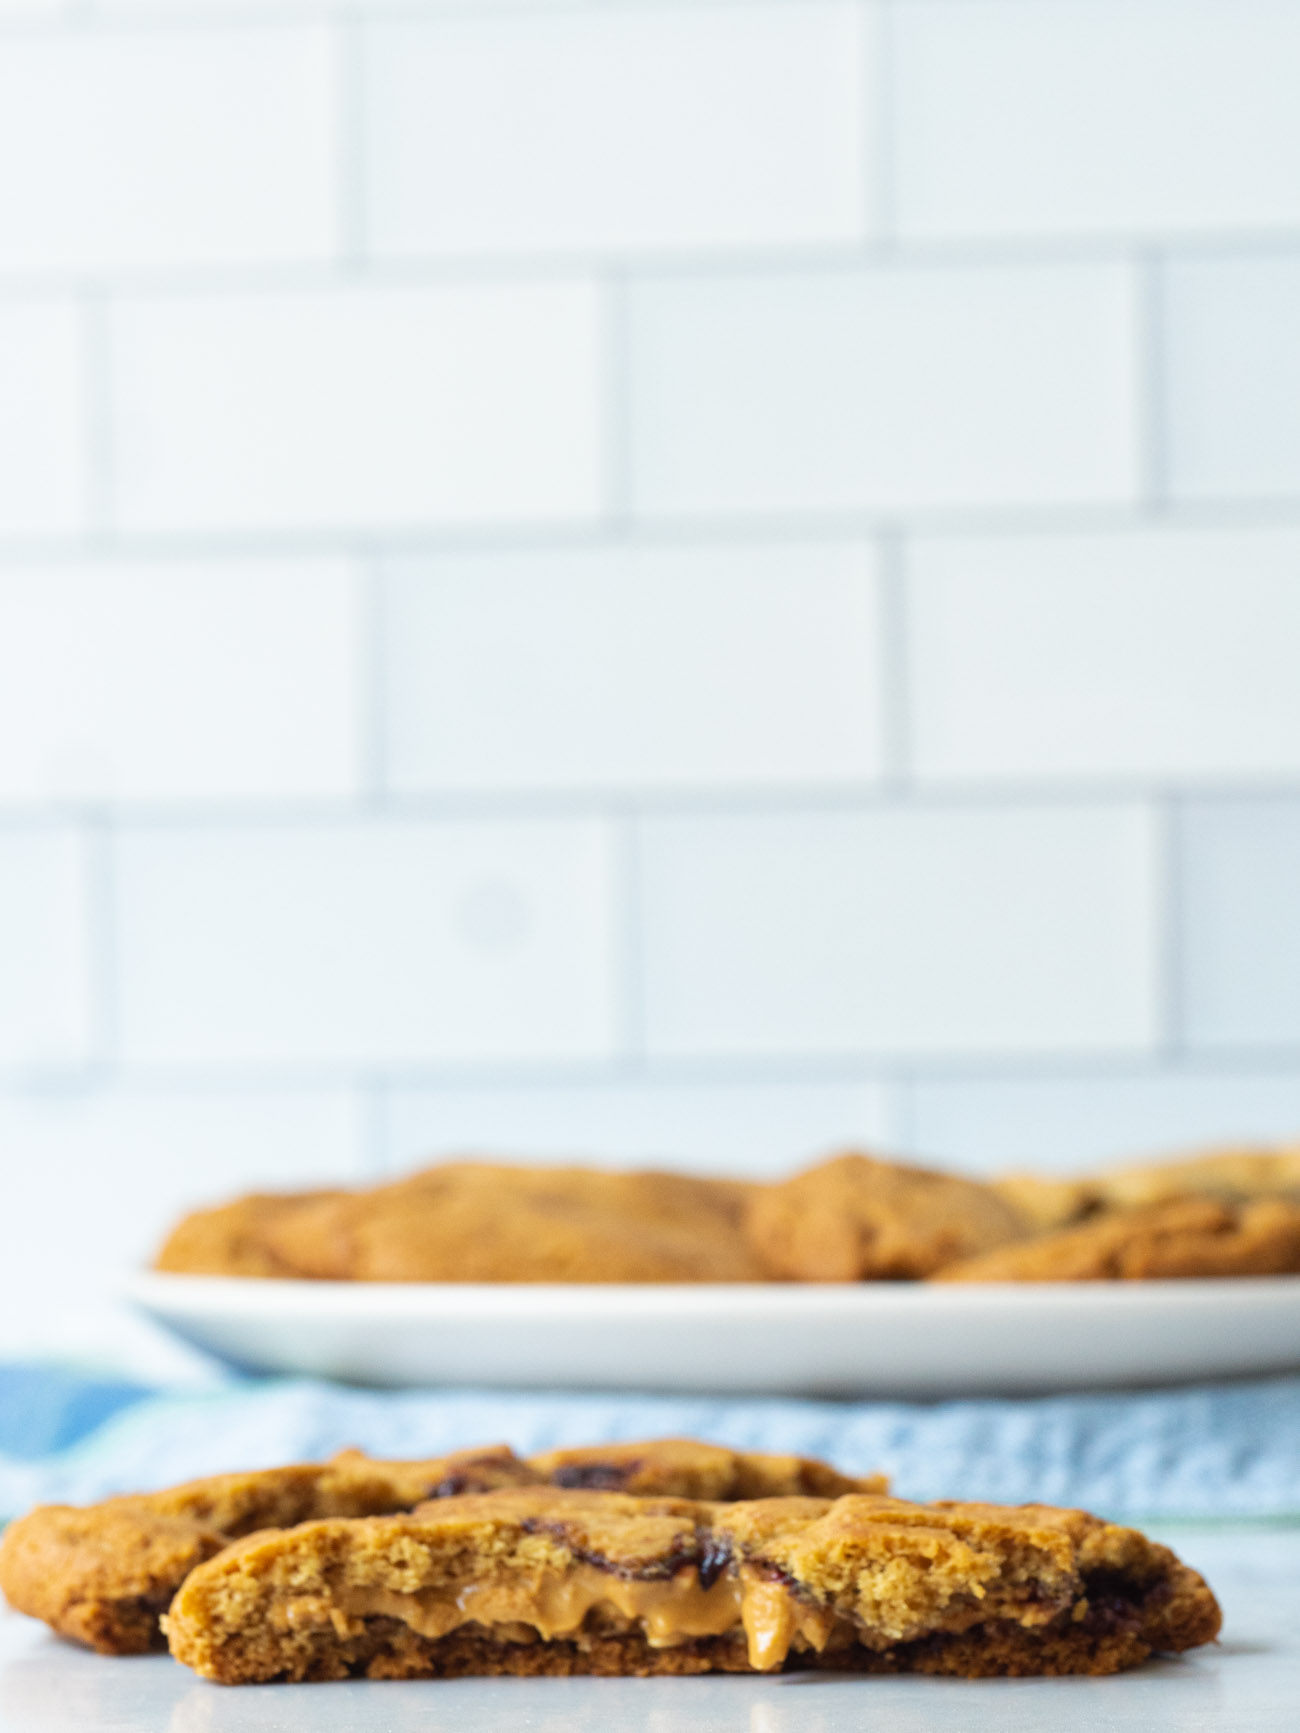 Peanut & Jelly Butter Stuffed Cookies